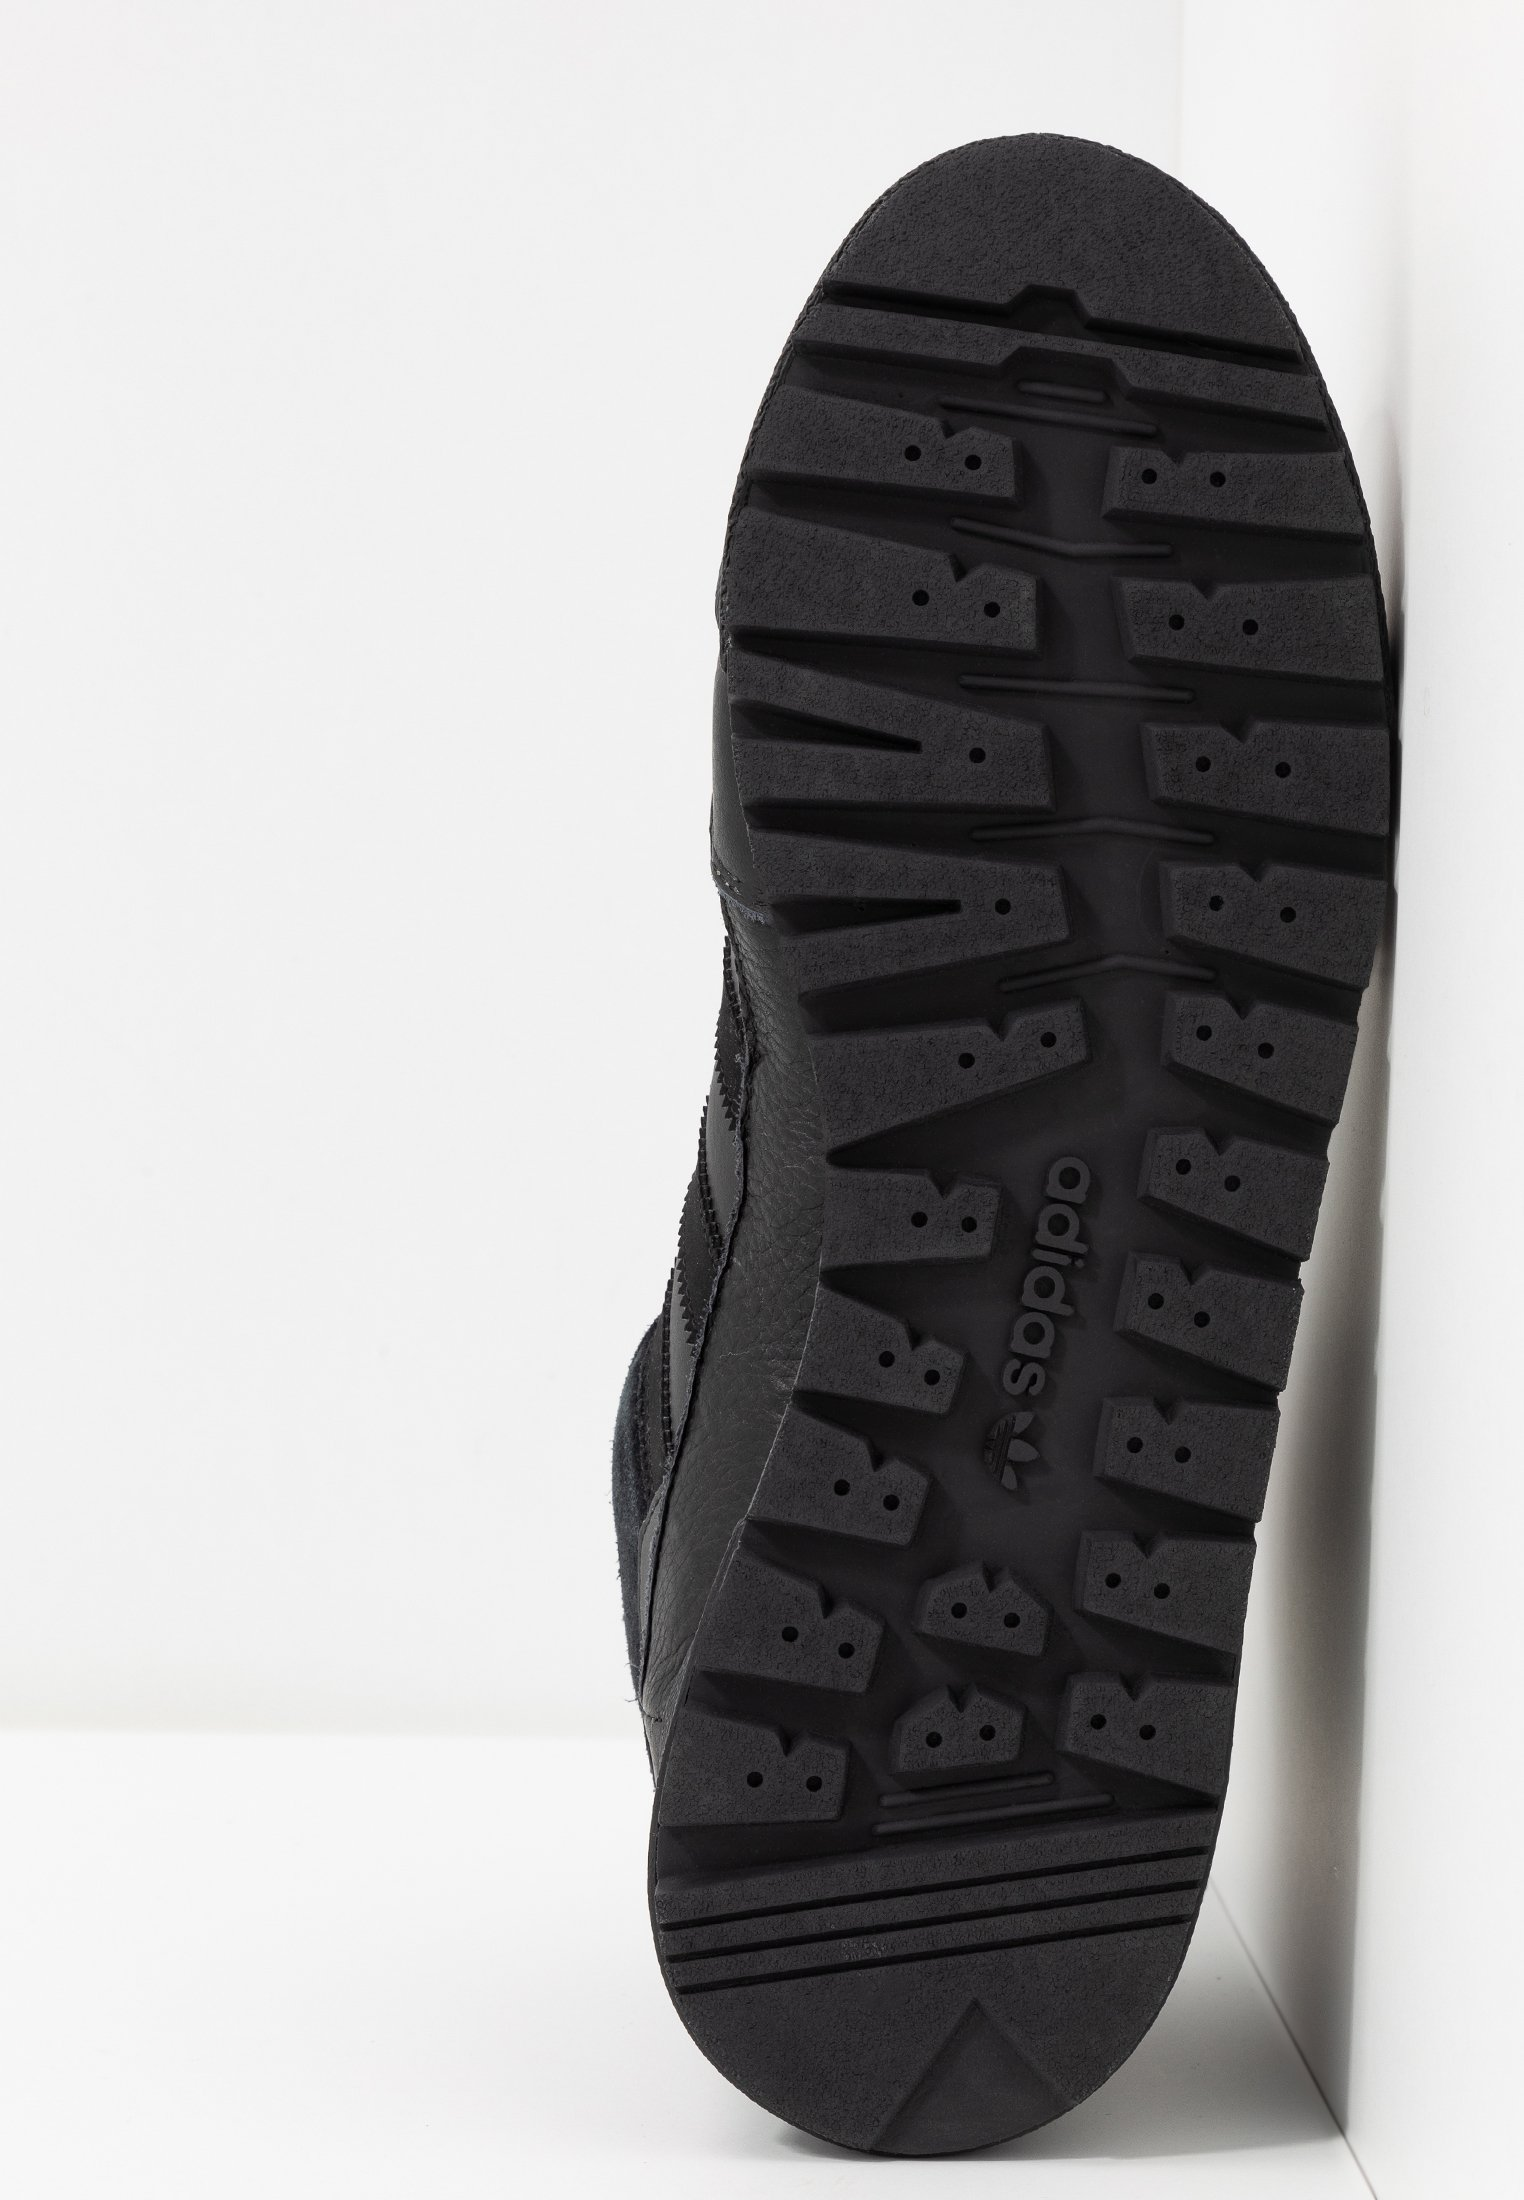 Geringster Preis adidas Originals BAARA - Sneaker high - core black | Damenbekleidung 2020